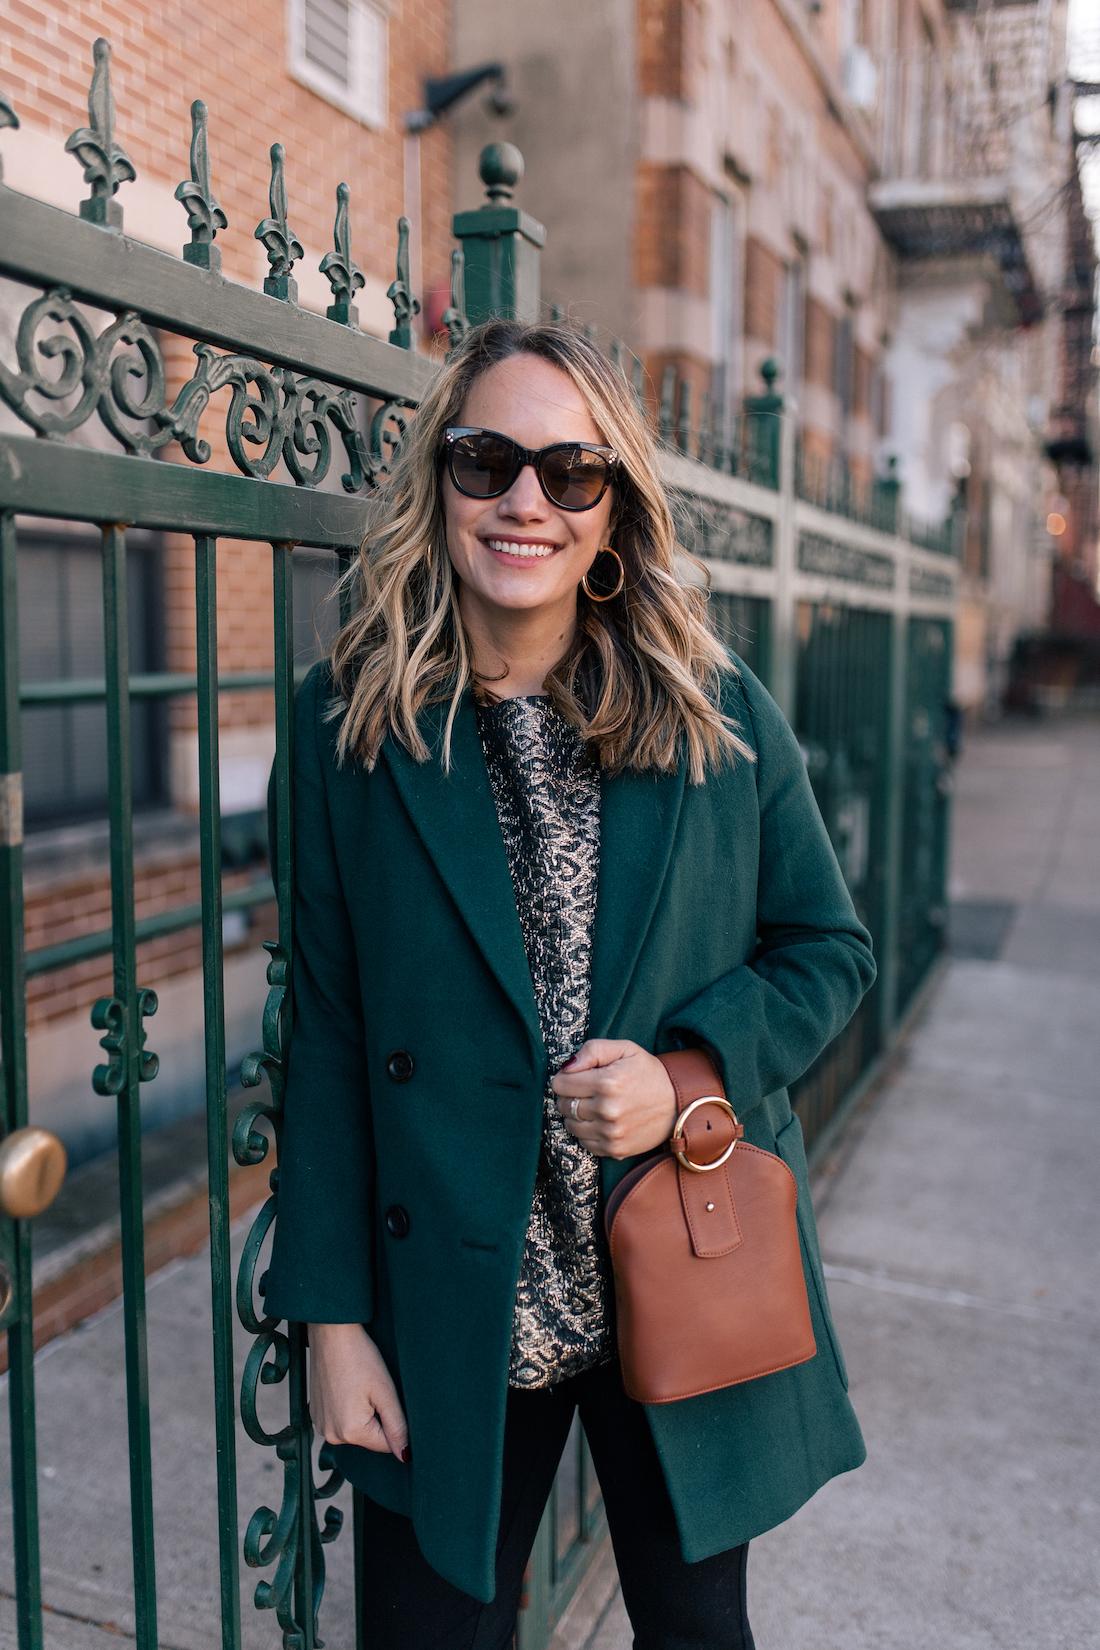 Outfit Details:Madewell Coat // Tuckernuck Top(c/o) // NYDJ Leggings // Polaroid Sunglasses // Parisa Wang Bag(c/o)